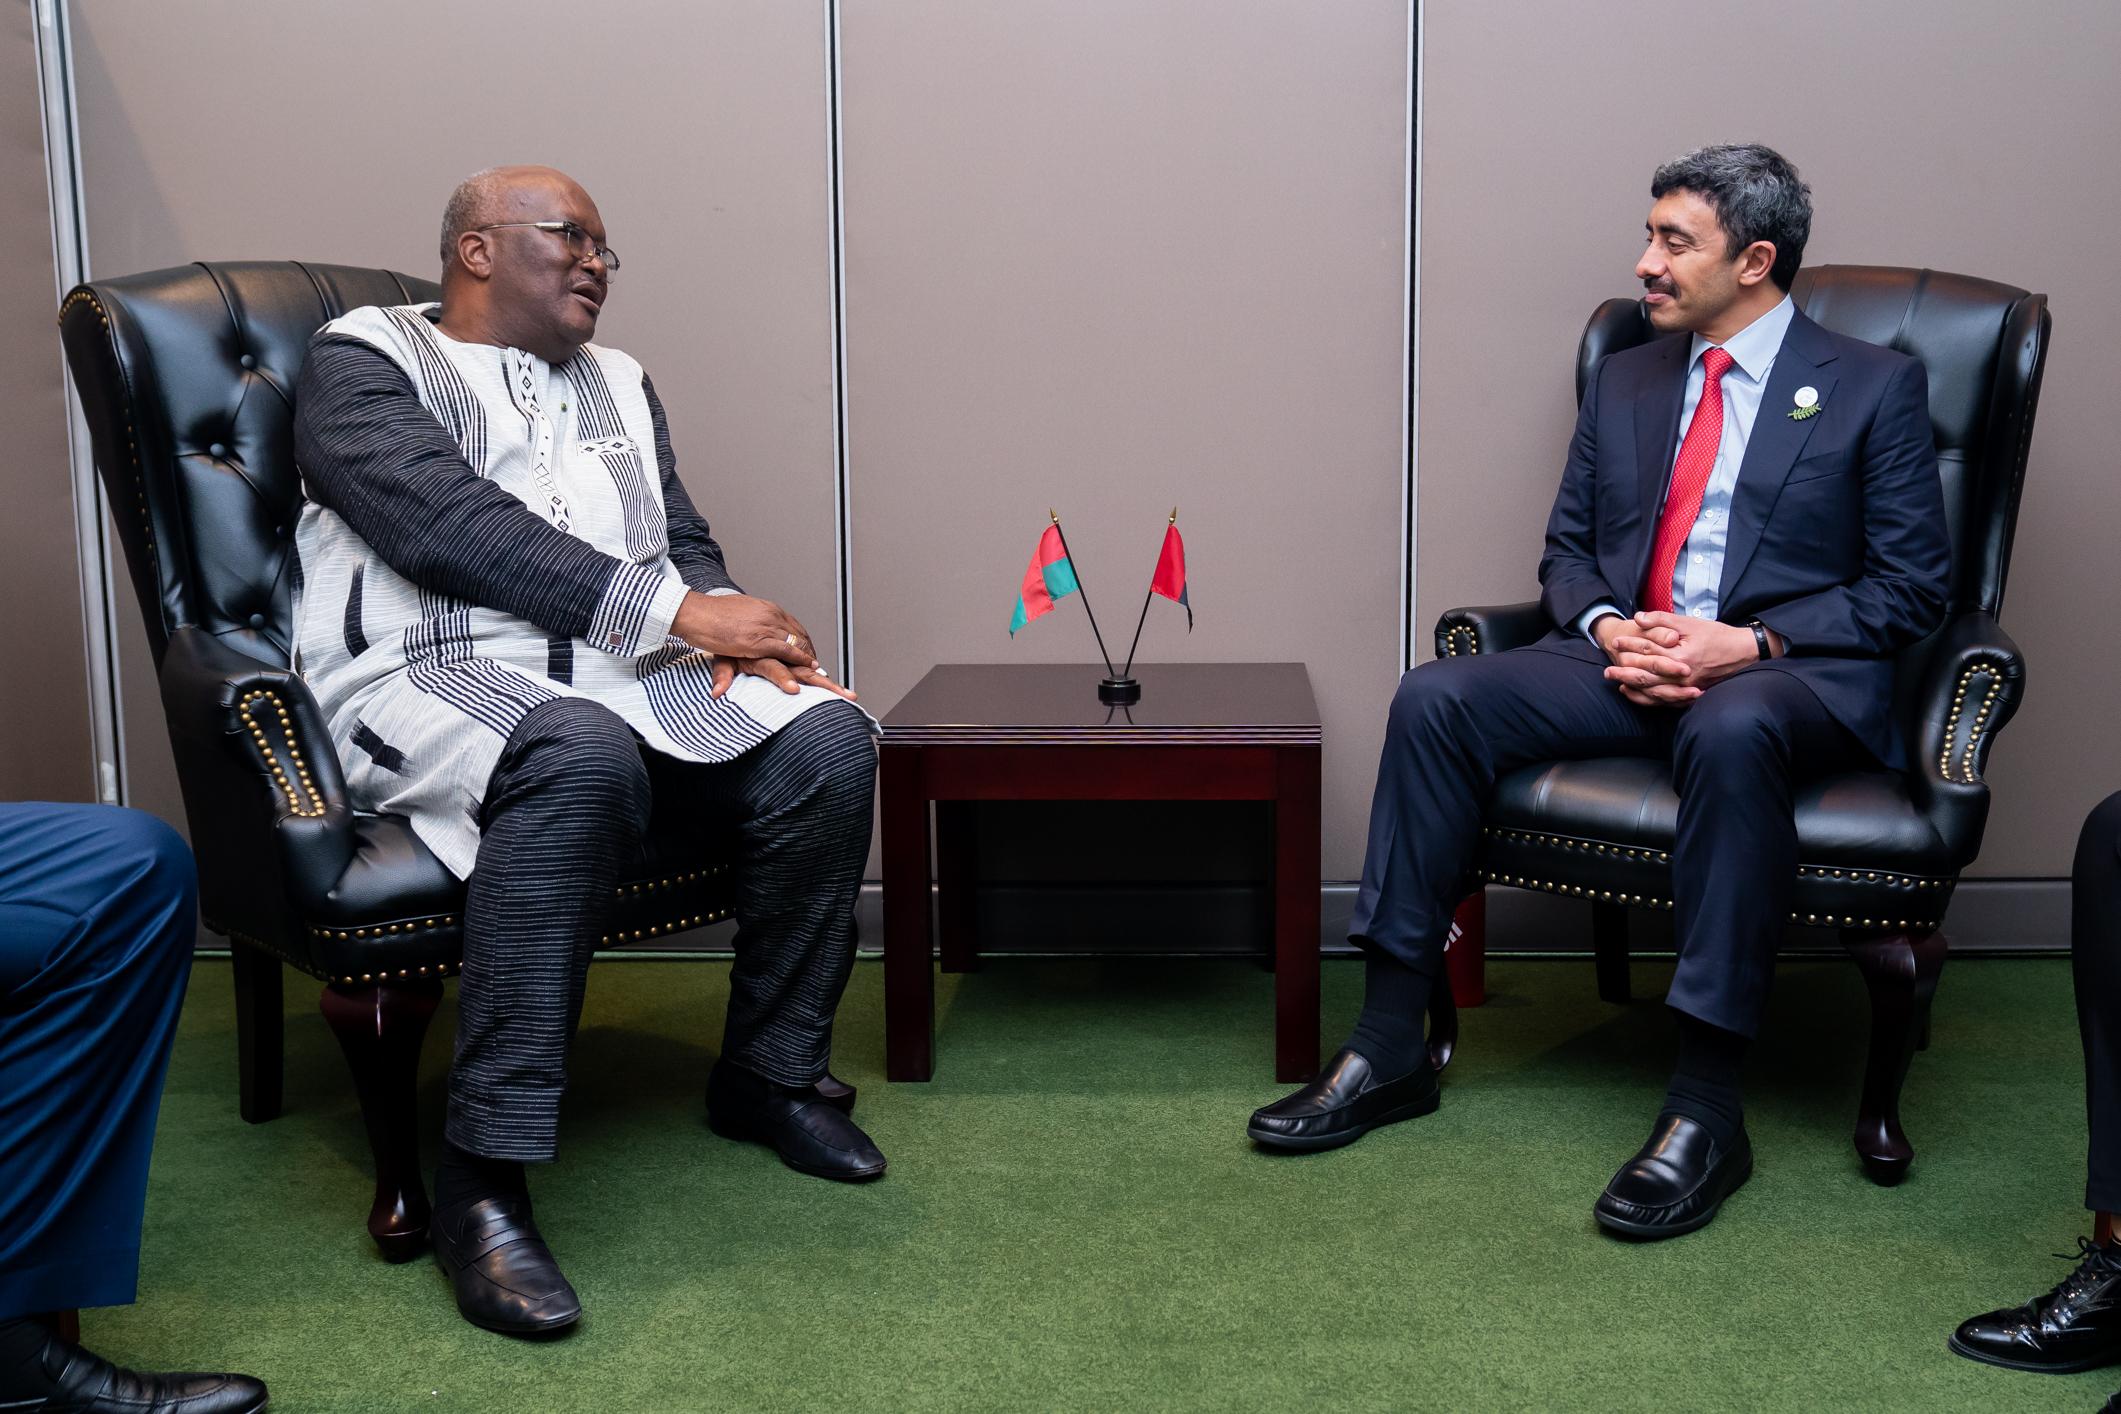 عبدالله بن زايد يلتقي رئيس بوركينا فاسو في نيويورك